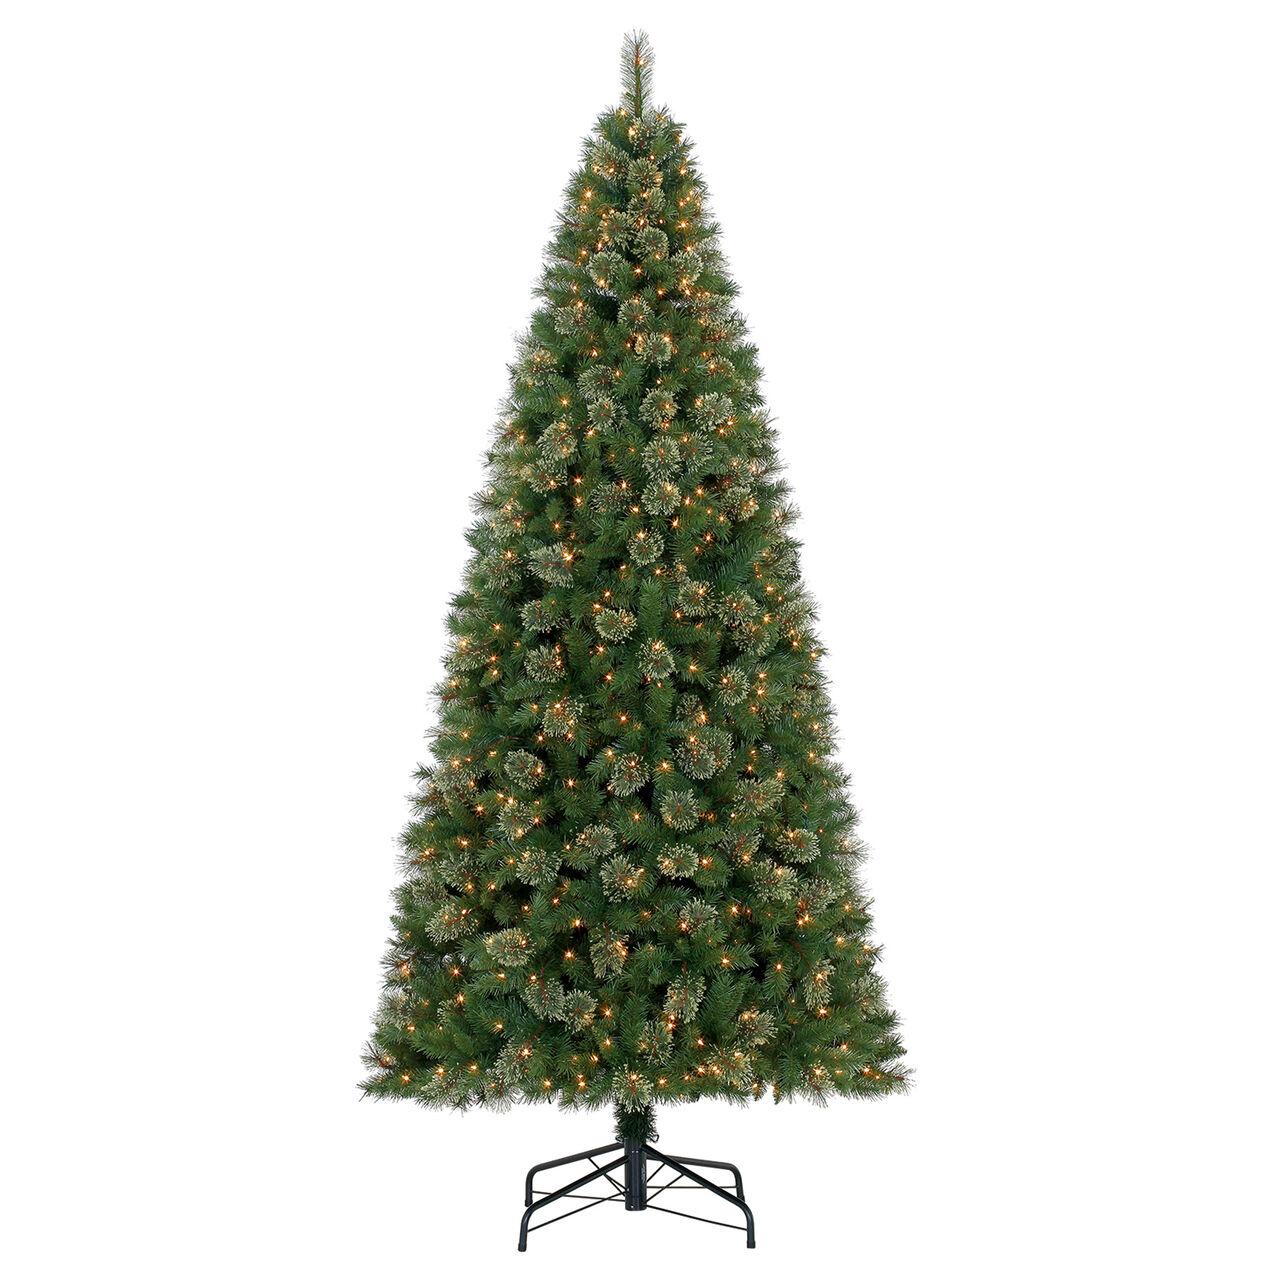 C34 10ft Pre Lit Anderson Fir Christmas Tree